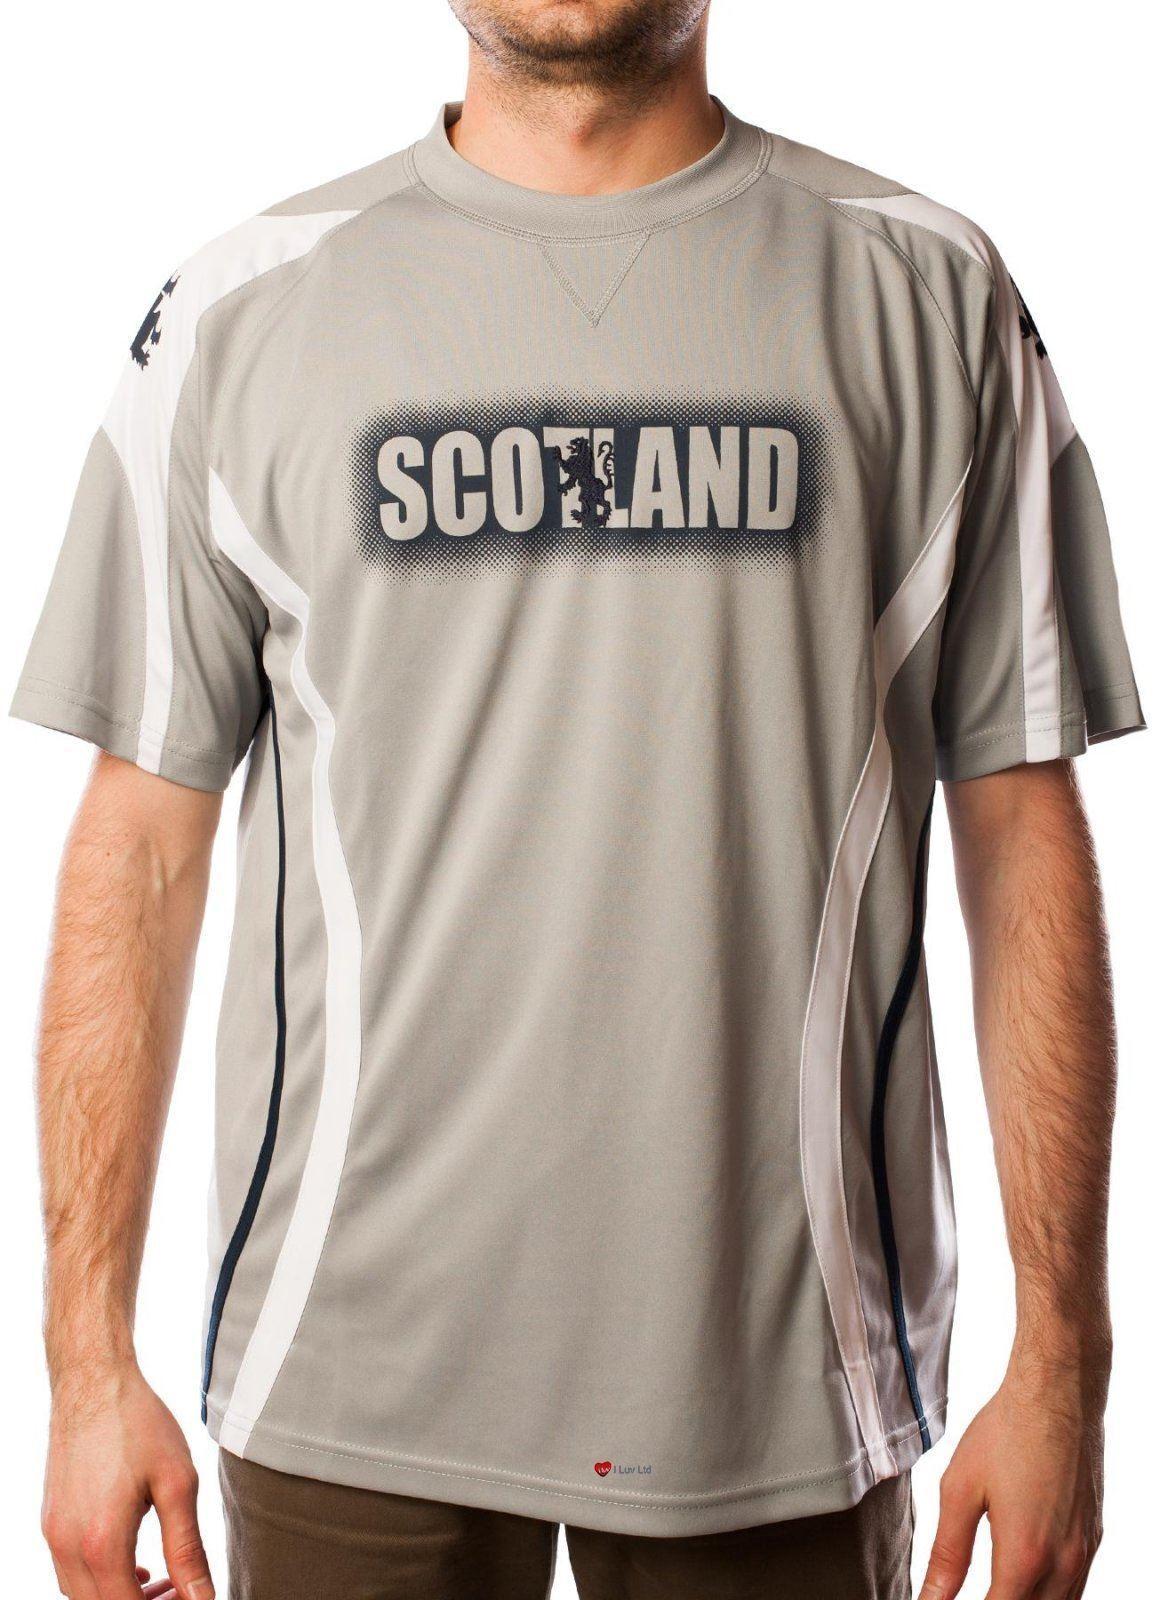 Mens Cool T-Shirt Rampant Lion Scotland Grey White Piping Size Medium